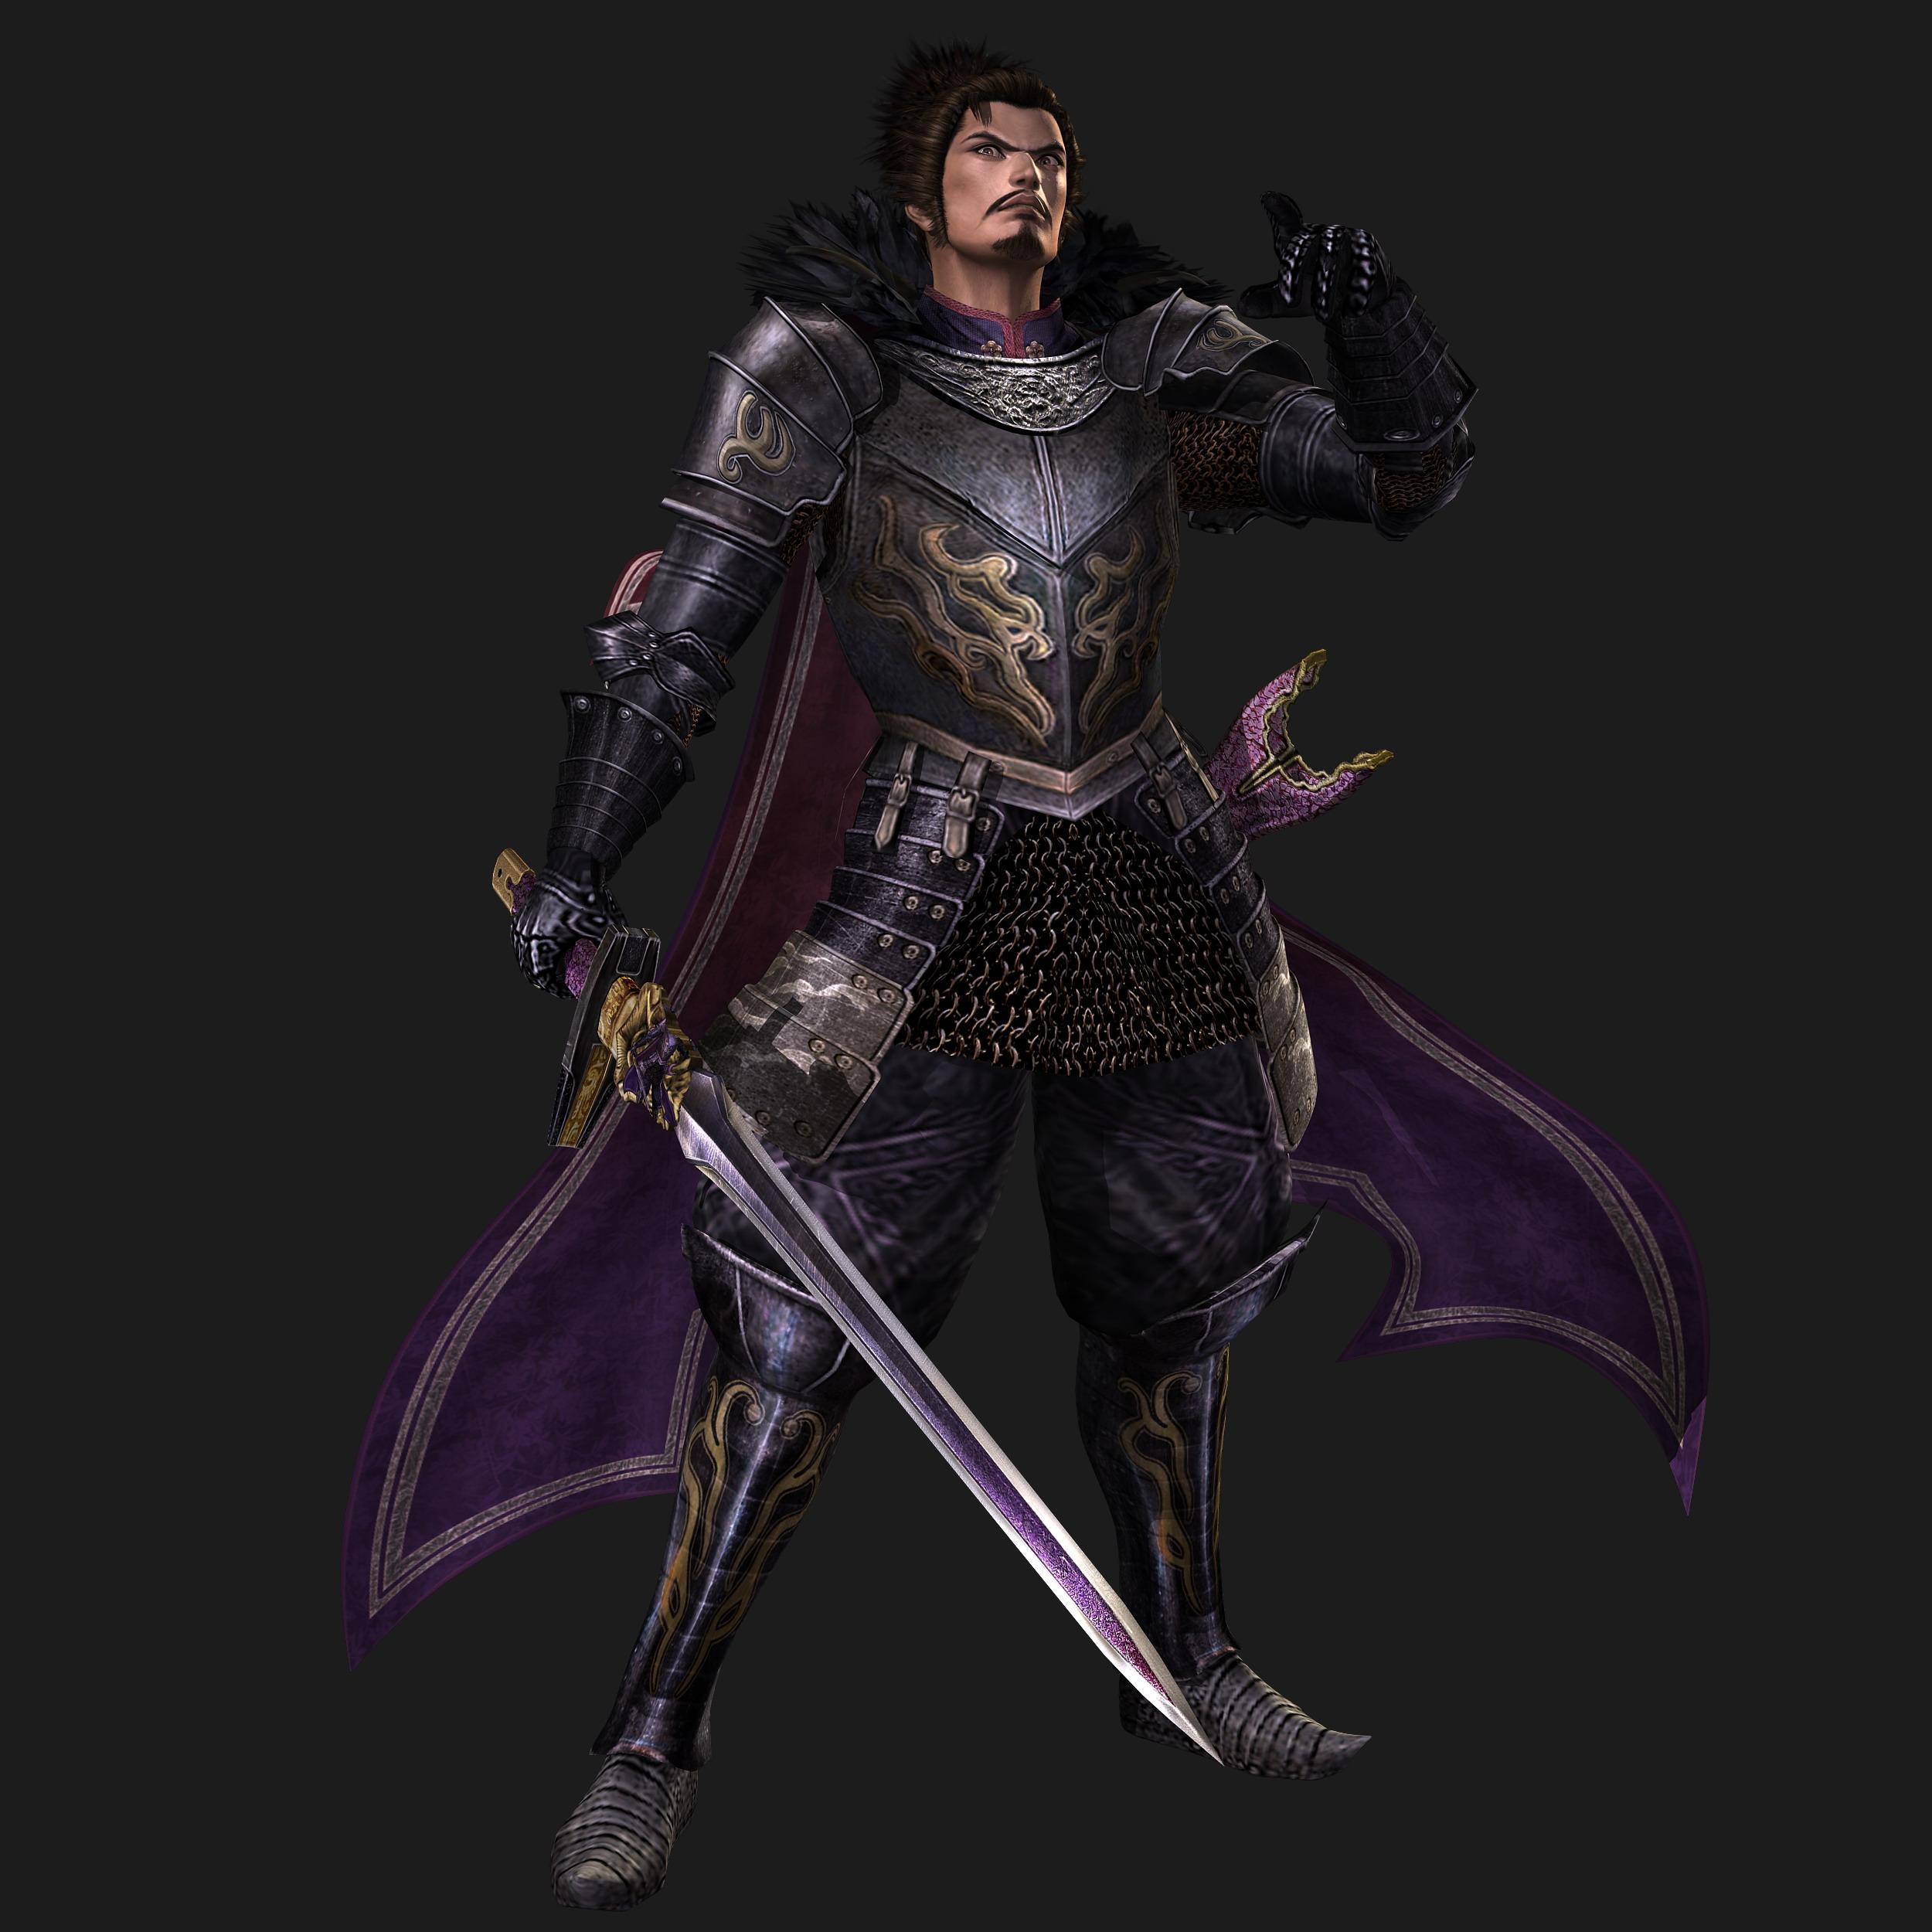 Warriors Orochi 3 Ultimate Nobunaga Oda: Oda Nobunaga (Sengoku Musou)